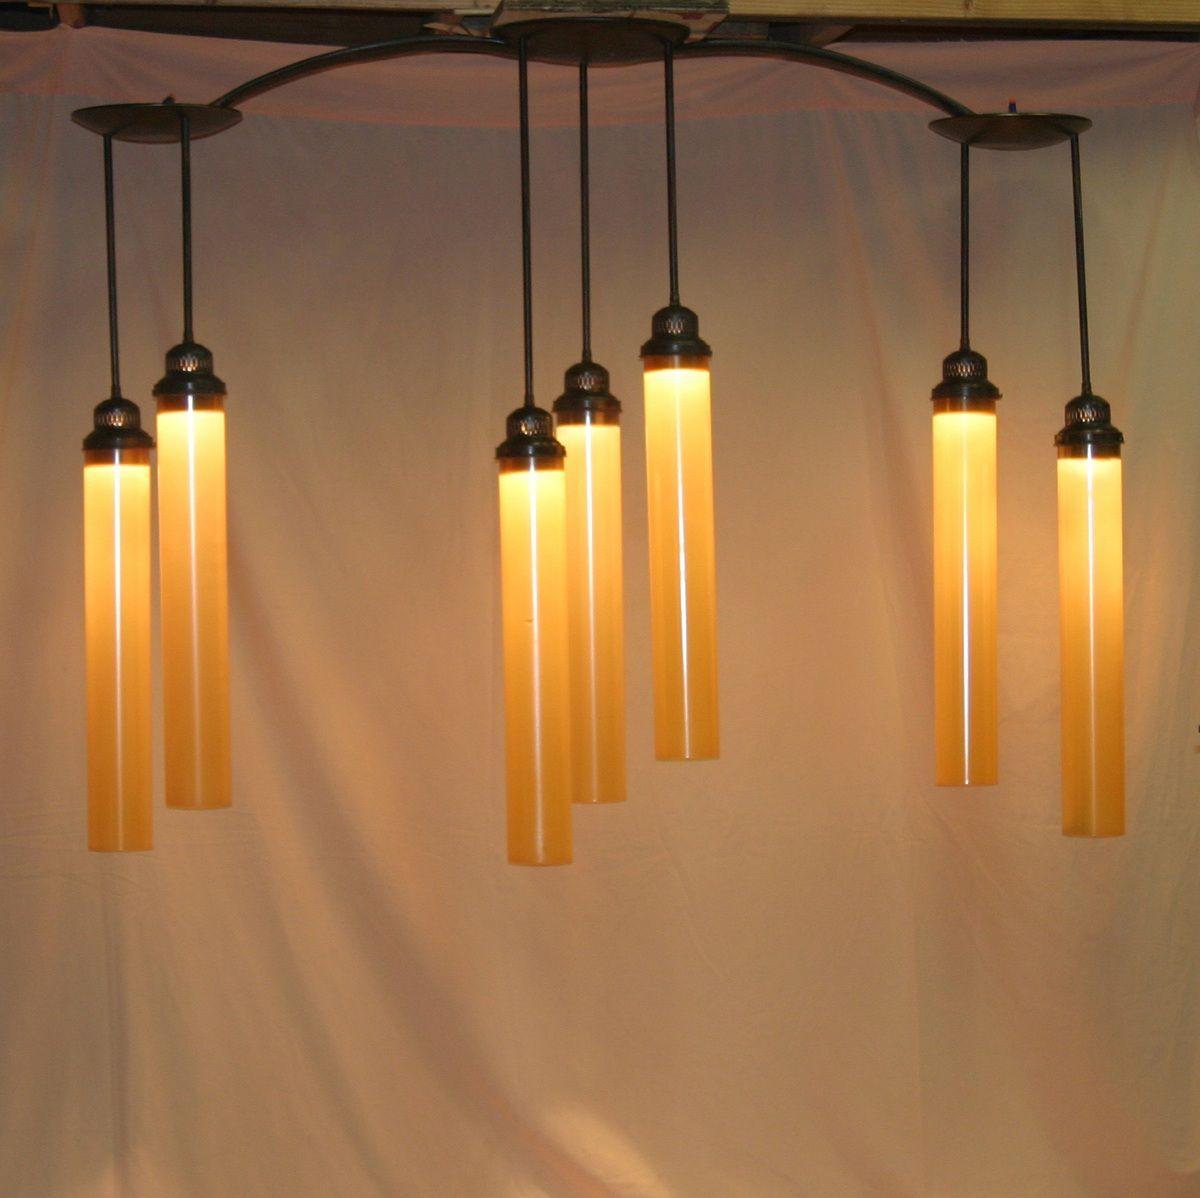 bathroom light fixtures in oil rubbed bronze | House Interior Design ...